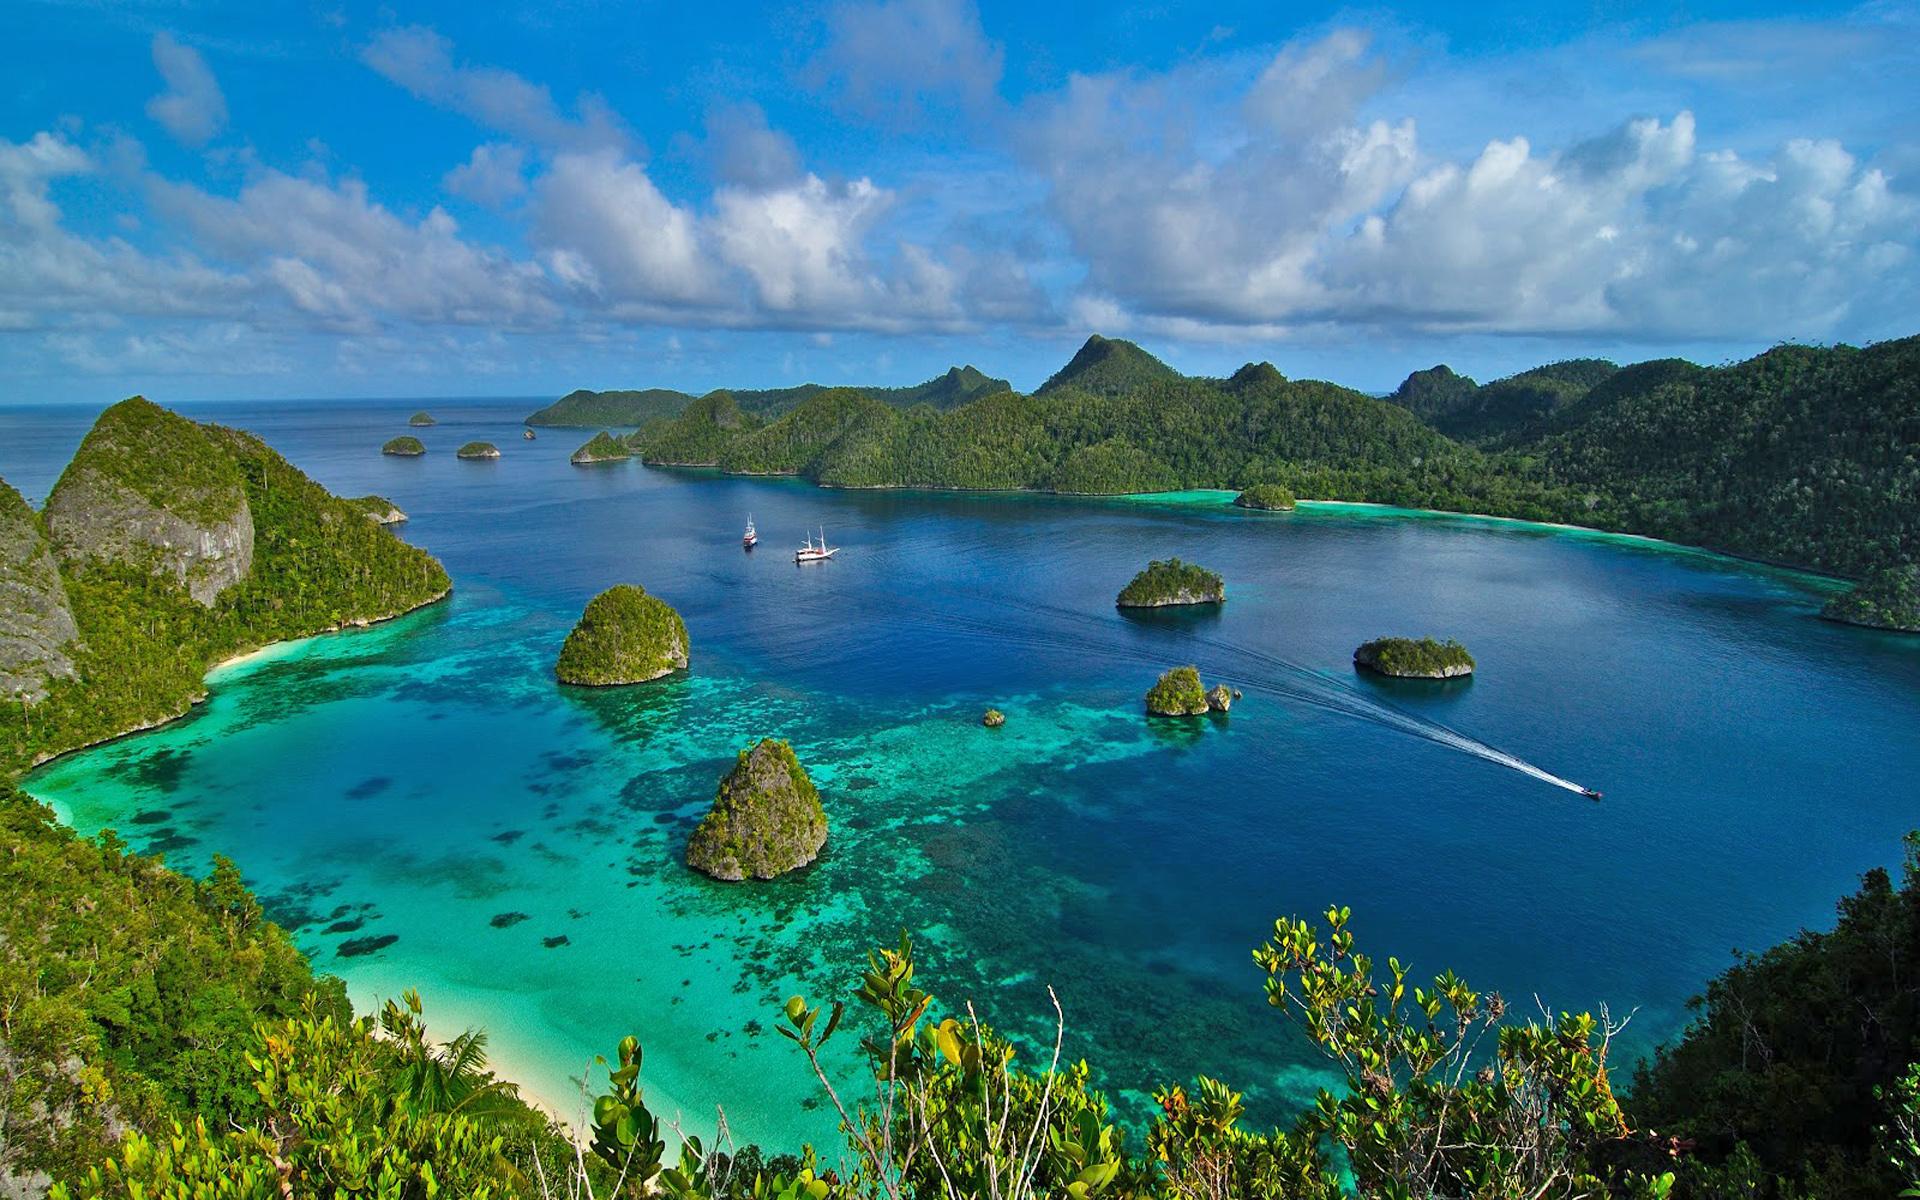 Ocean Waves Iphone Wallpaper Raja Ampat Indonesia Lovely Ocean Bay Islands With Green